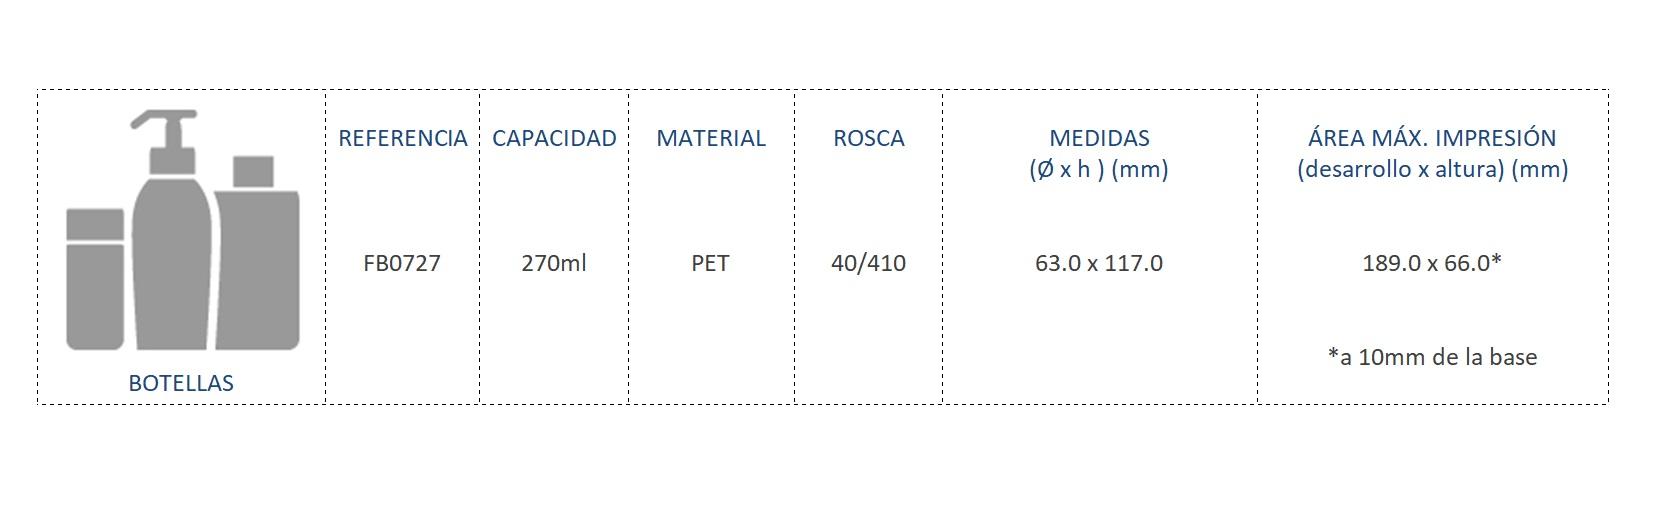 Cuadro de materiales botella FB0727